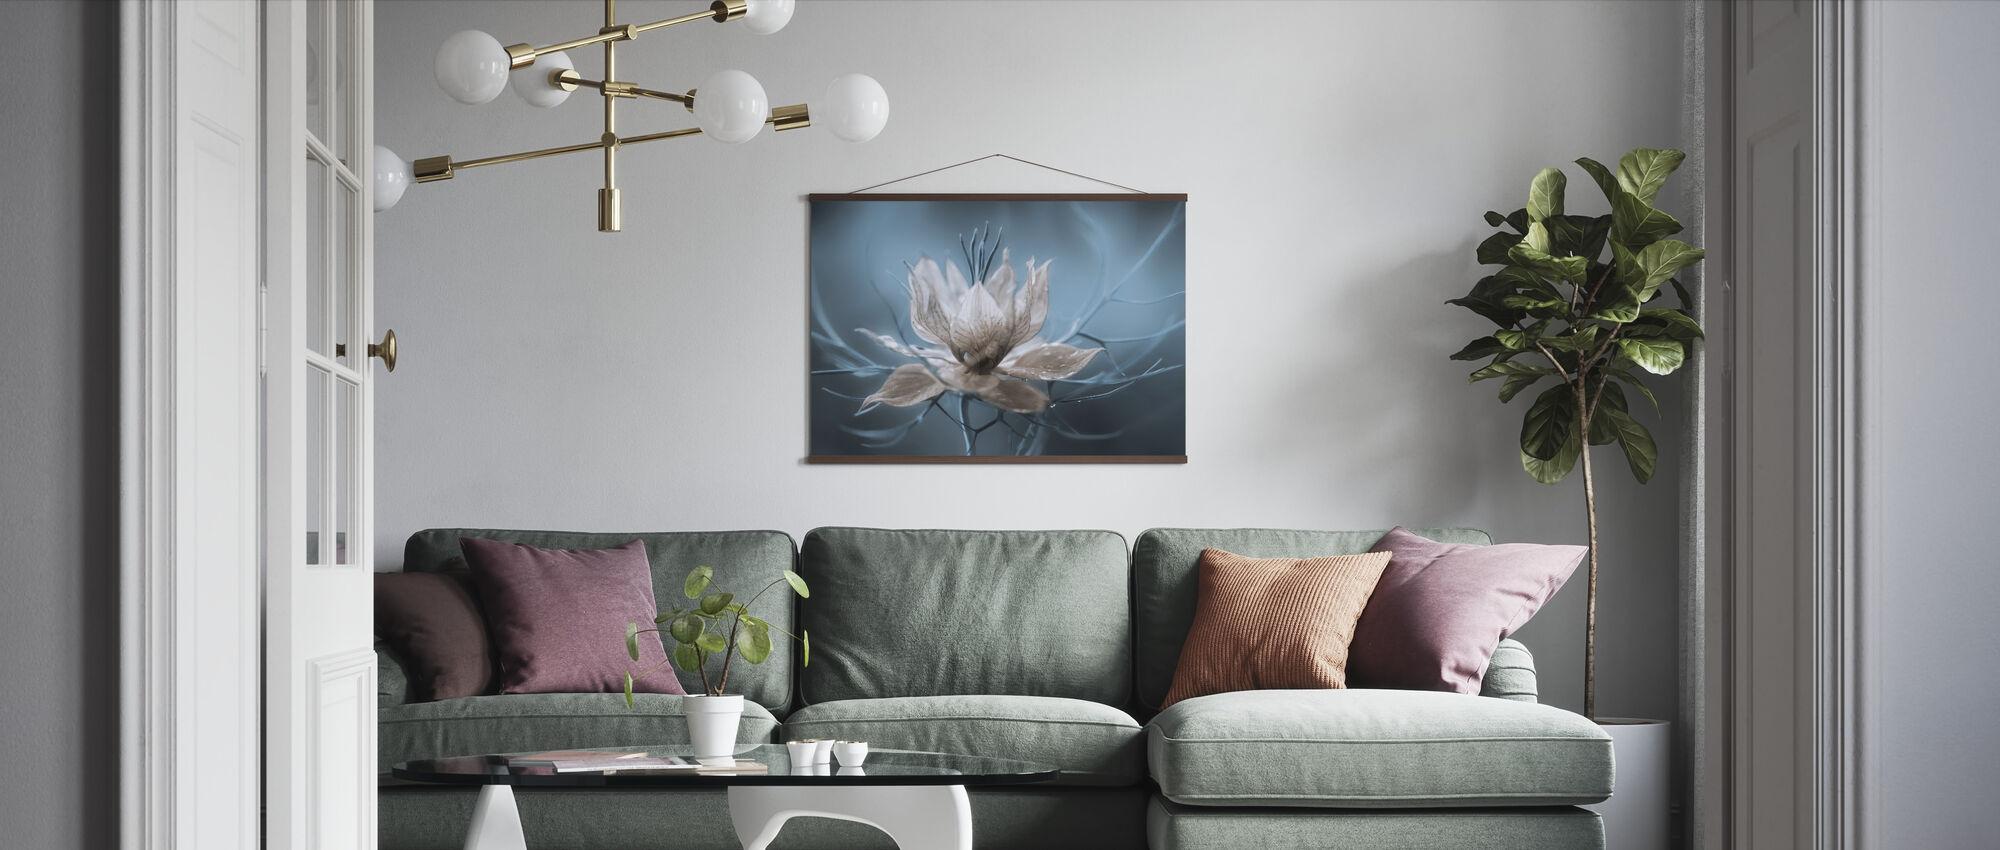 Nigella - Poster - Living Room